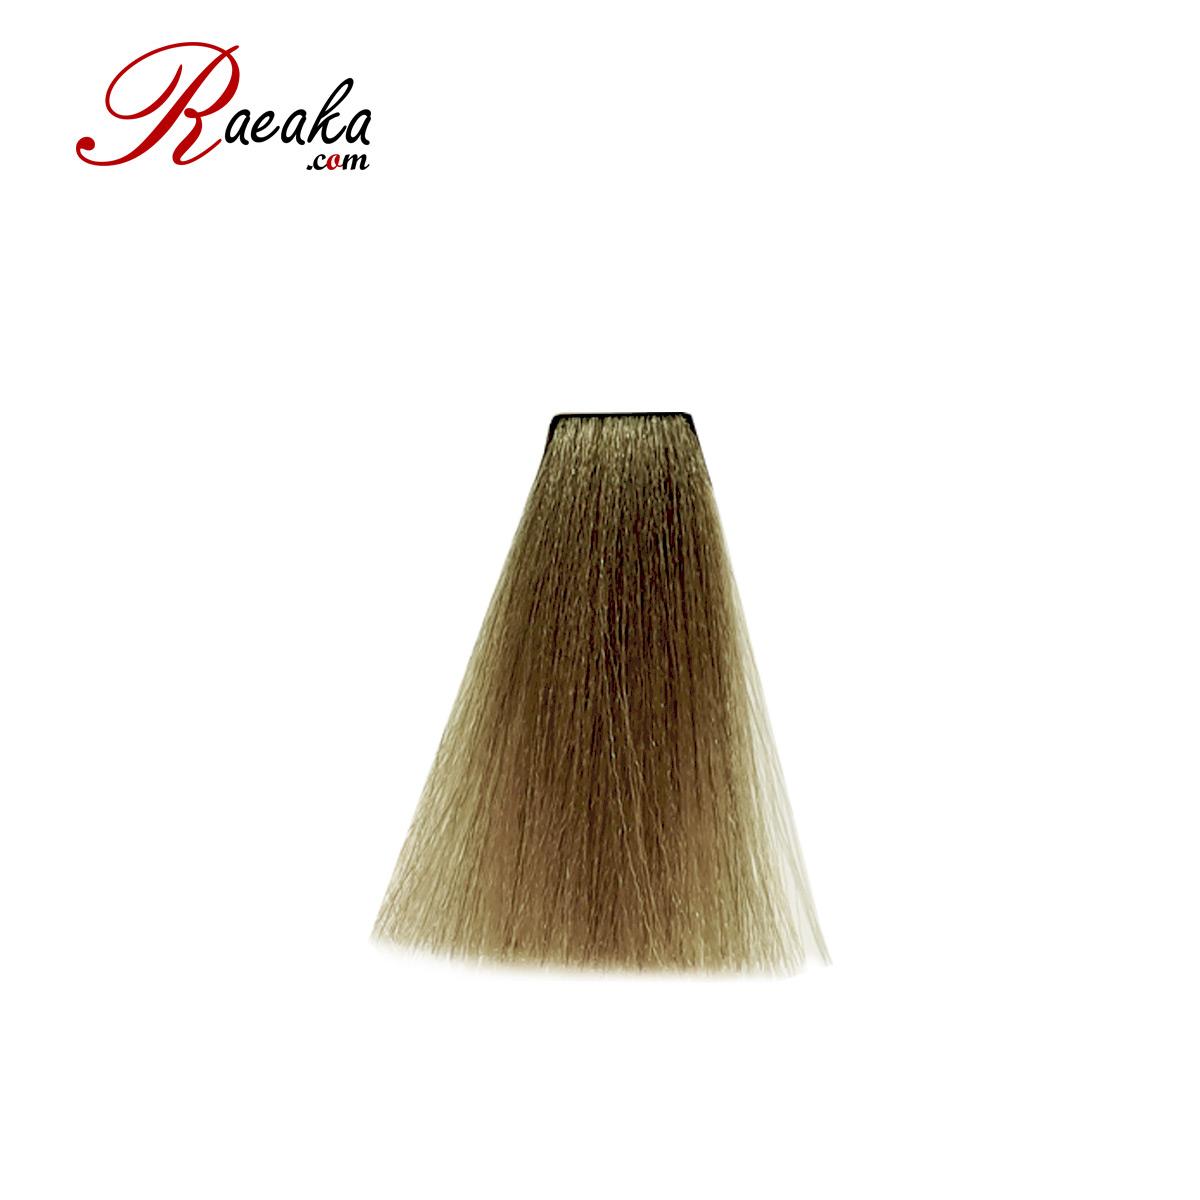 رنگ مو دوشس سری عسلی شماره 1-9 حجم 125 میلی لیتر